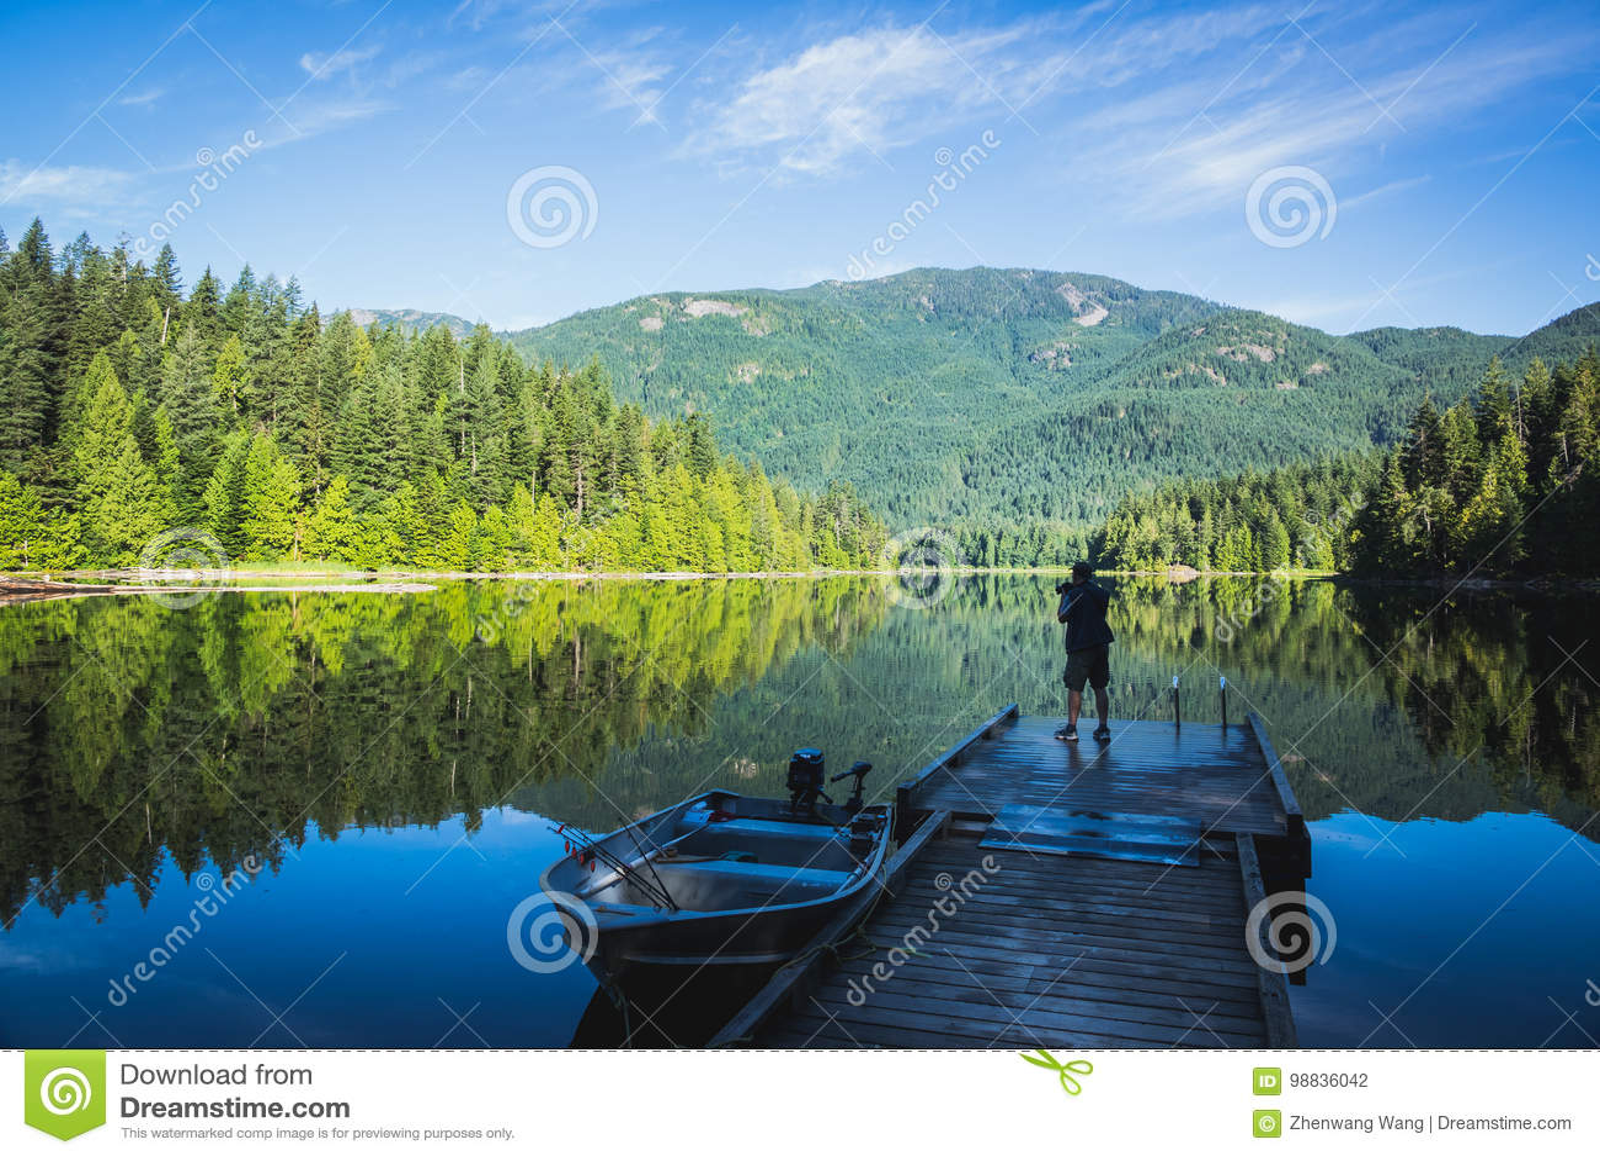 Weaver lake in the morning